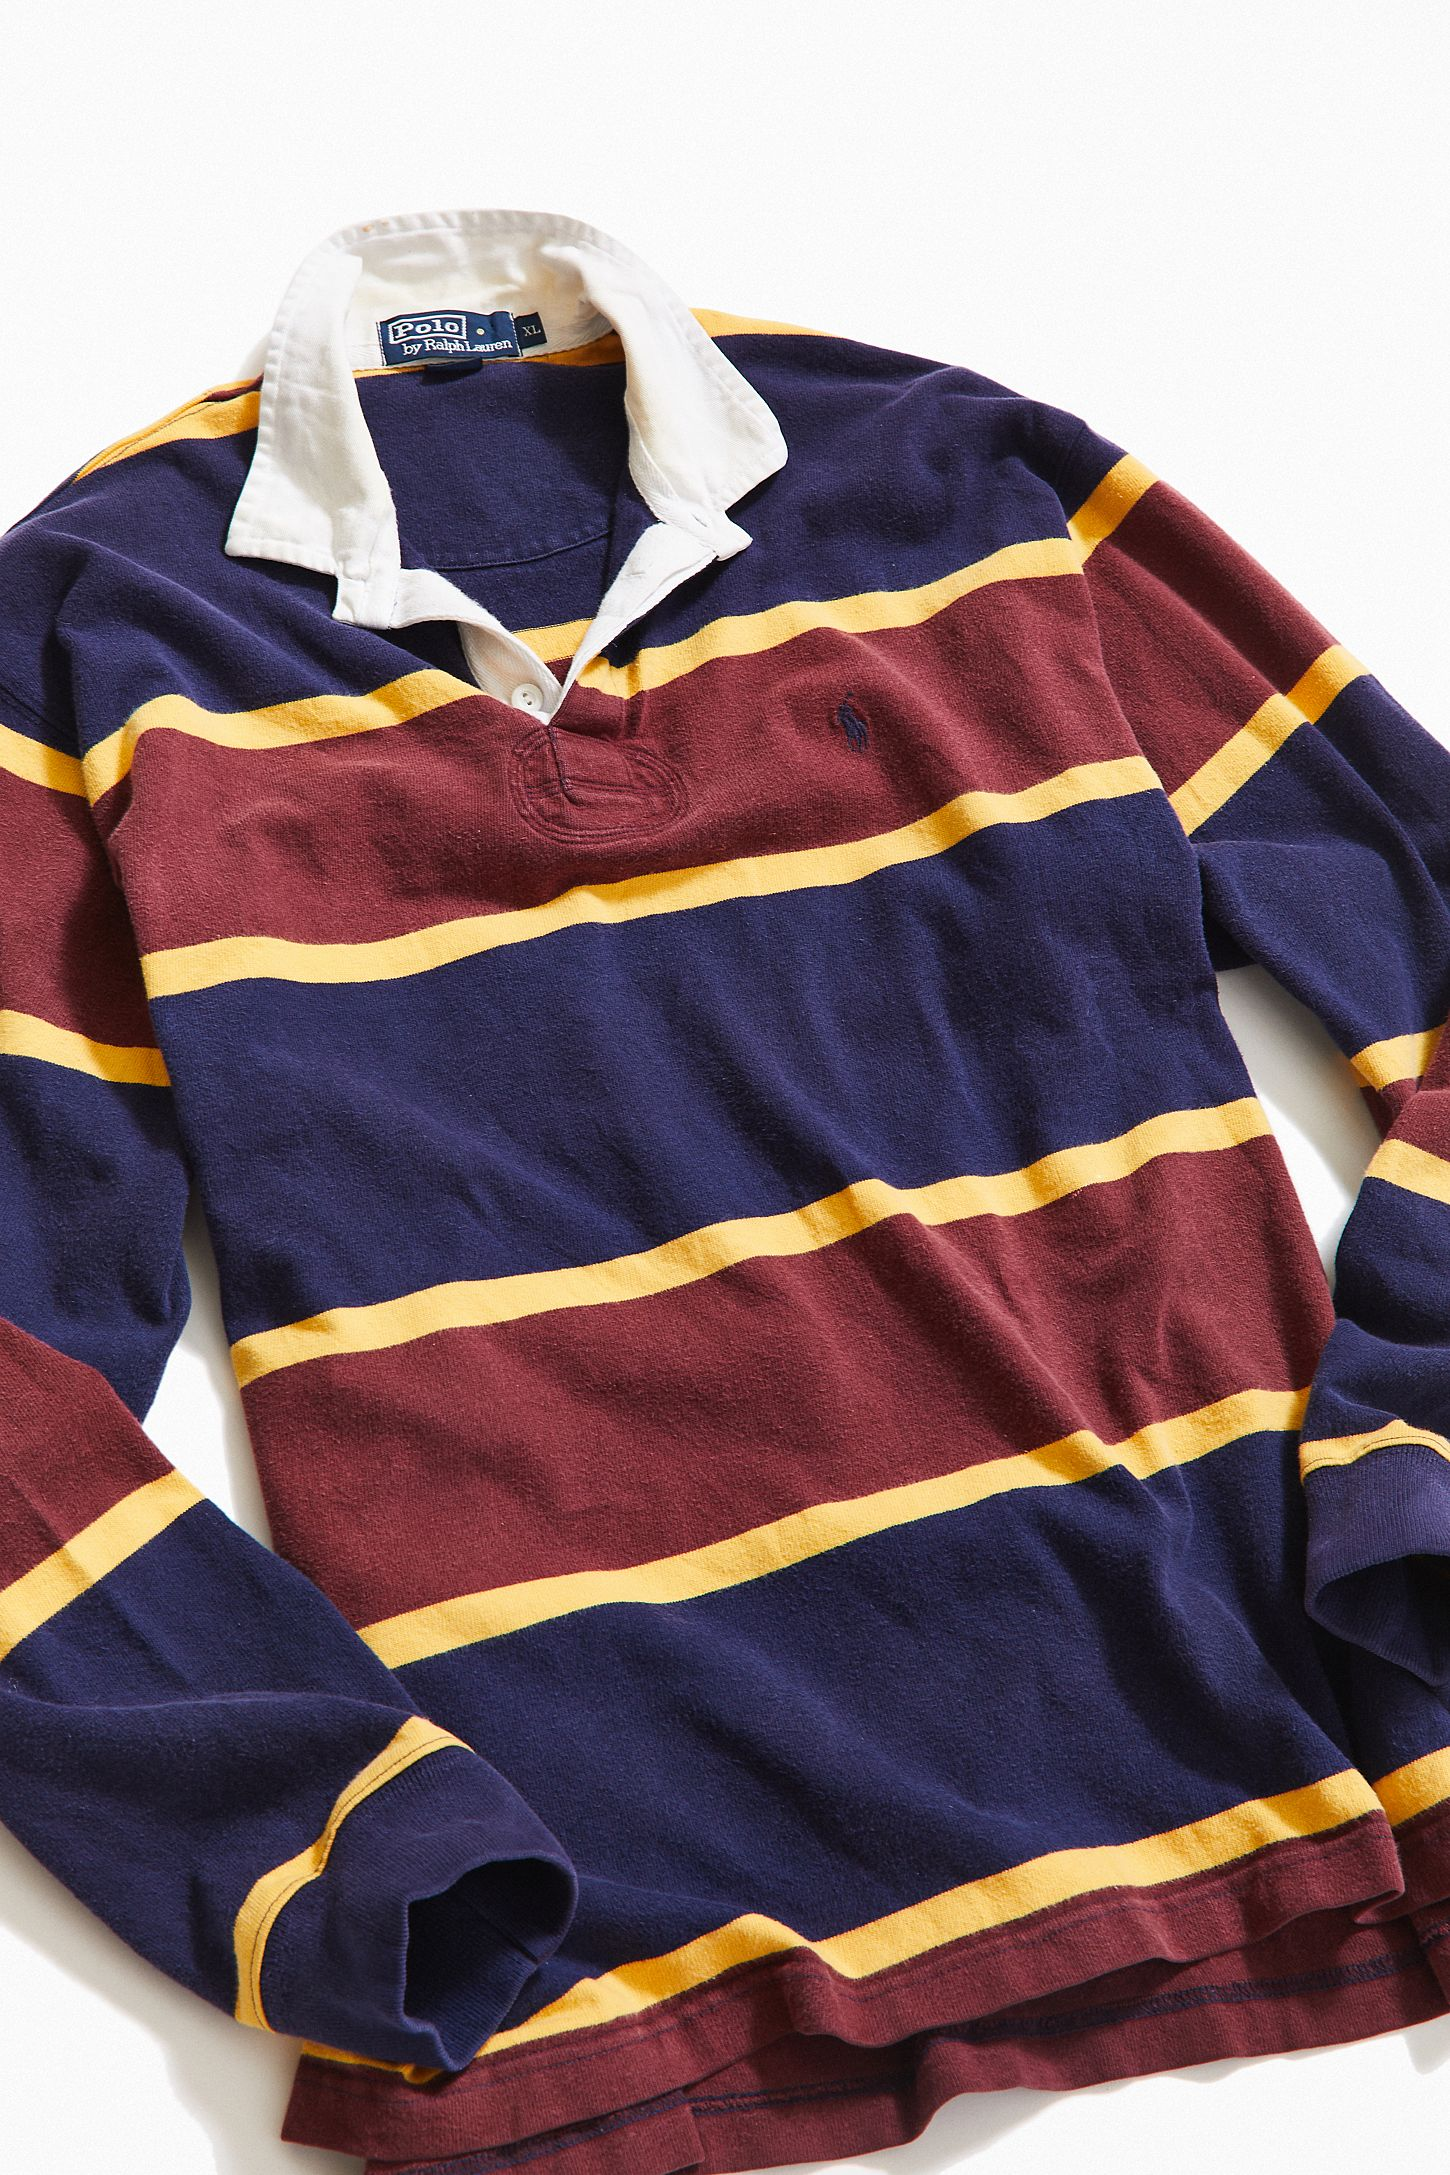 0e714250d1b Vintage Polo Ralph Lauren Blocked Stripe Rugby Shirt